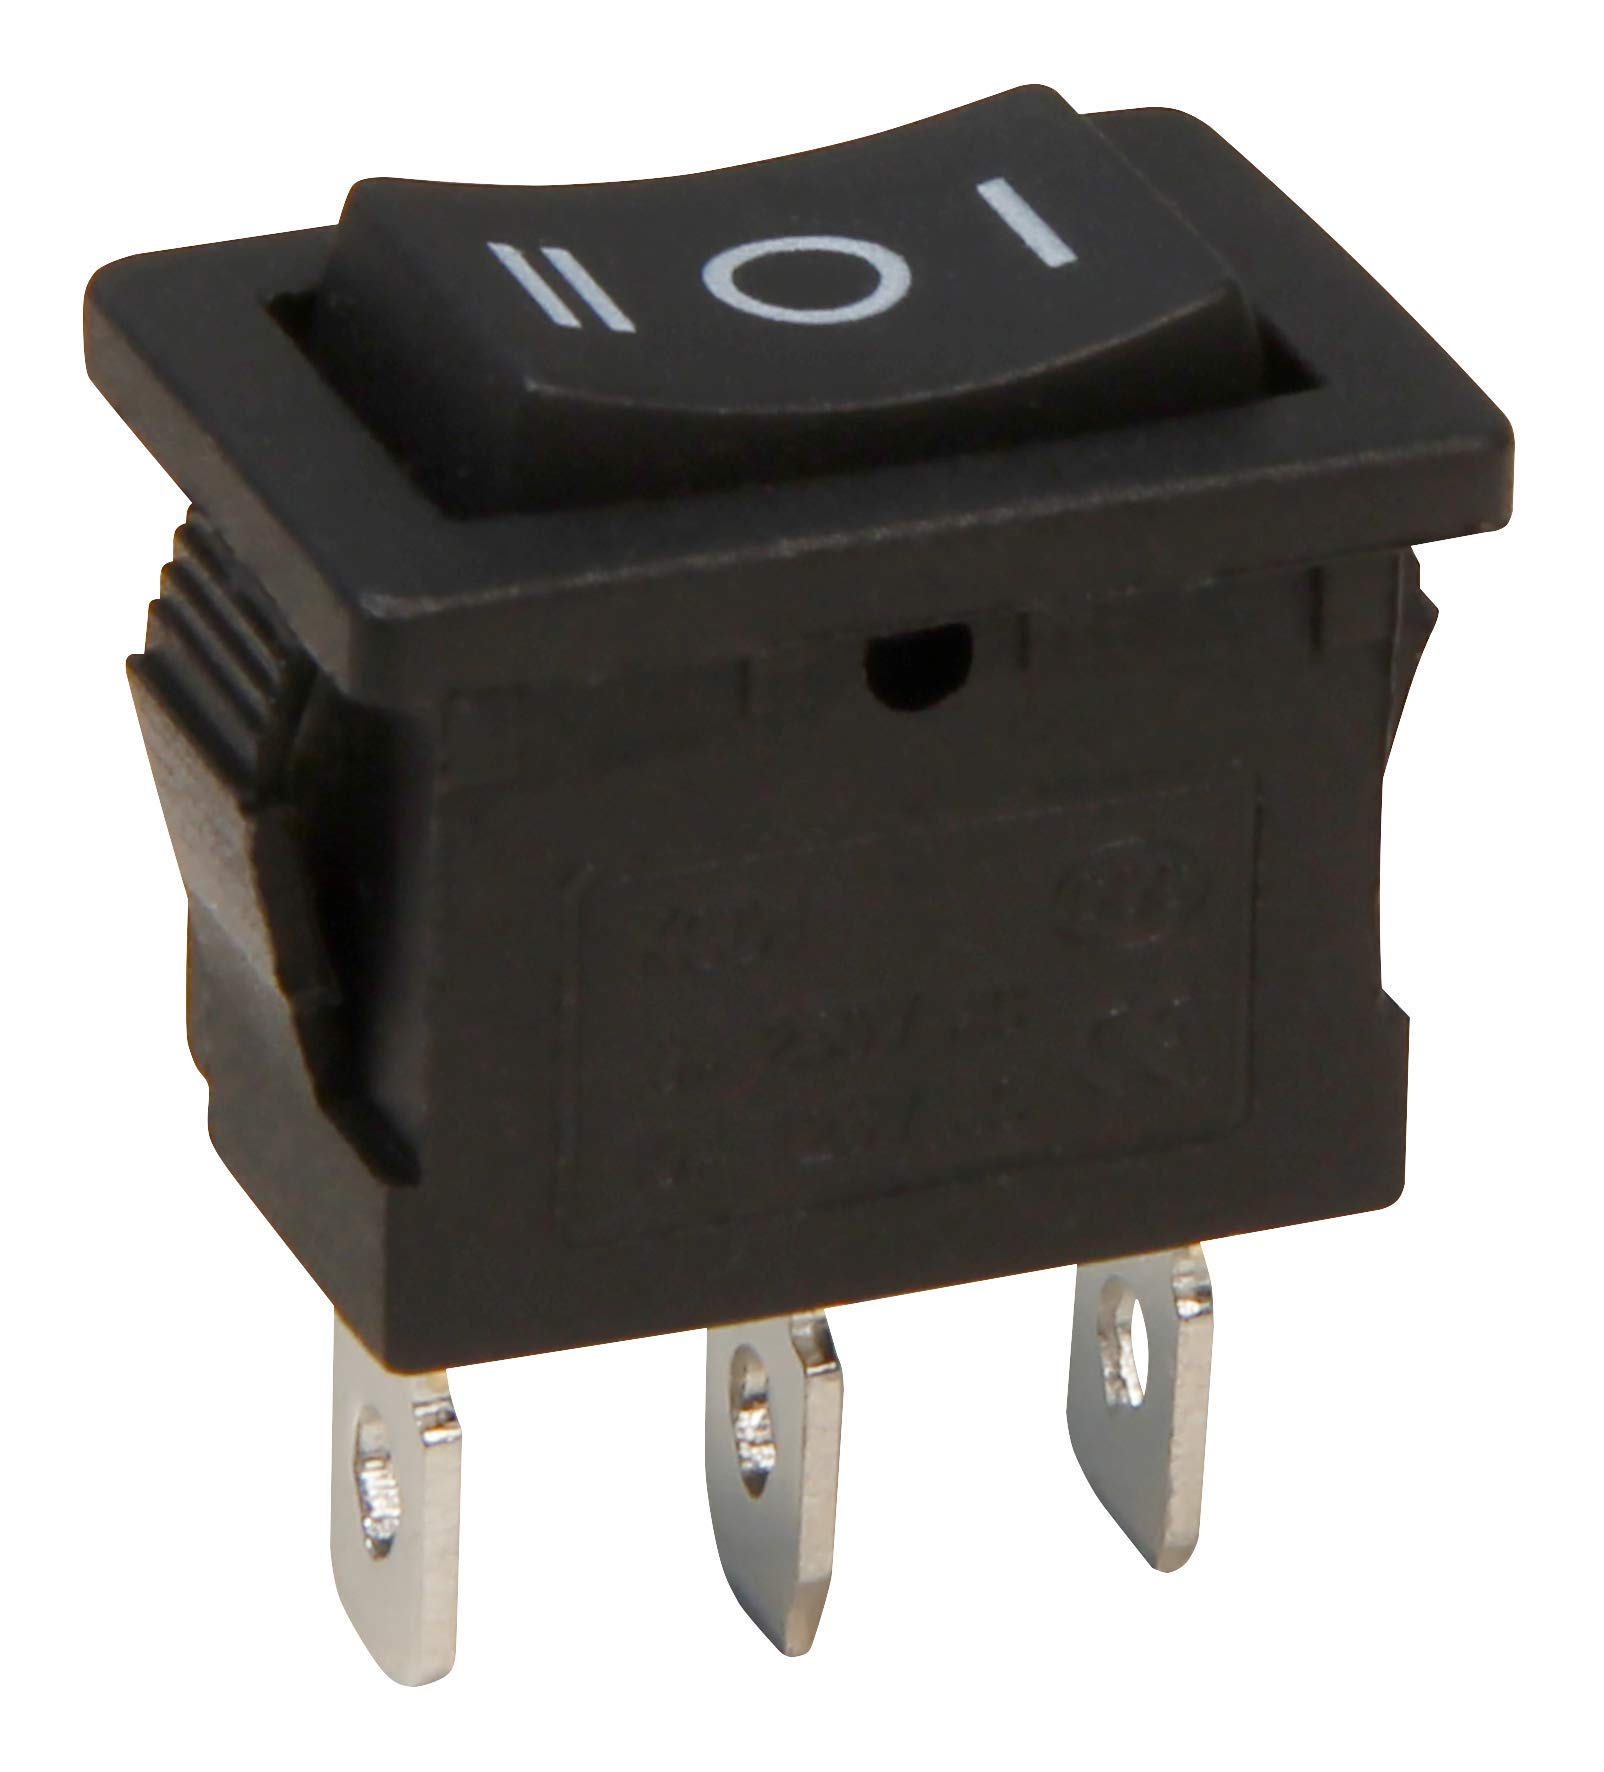 McPower 1323077ブラックロッカー極ロッカースイッチ3 AC 250 V / 6